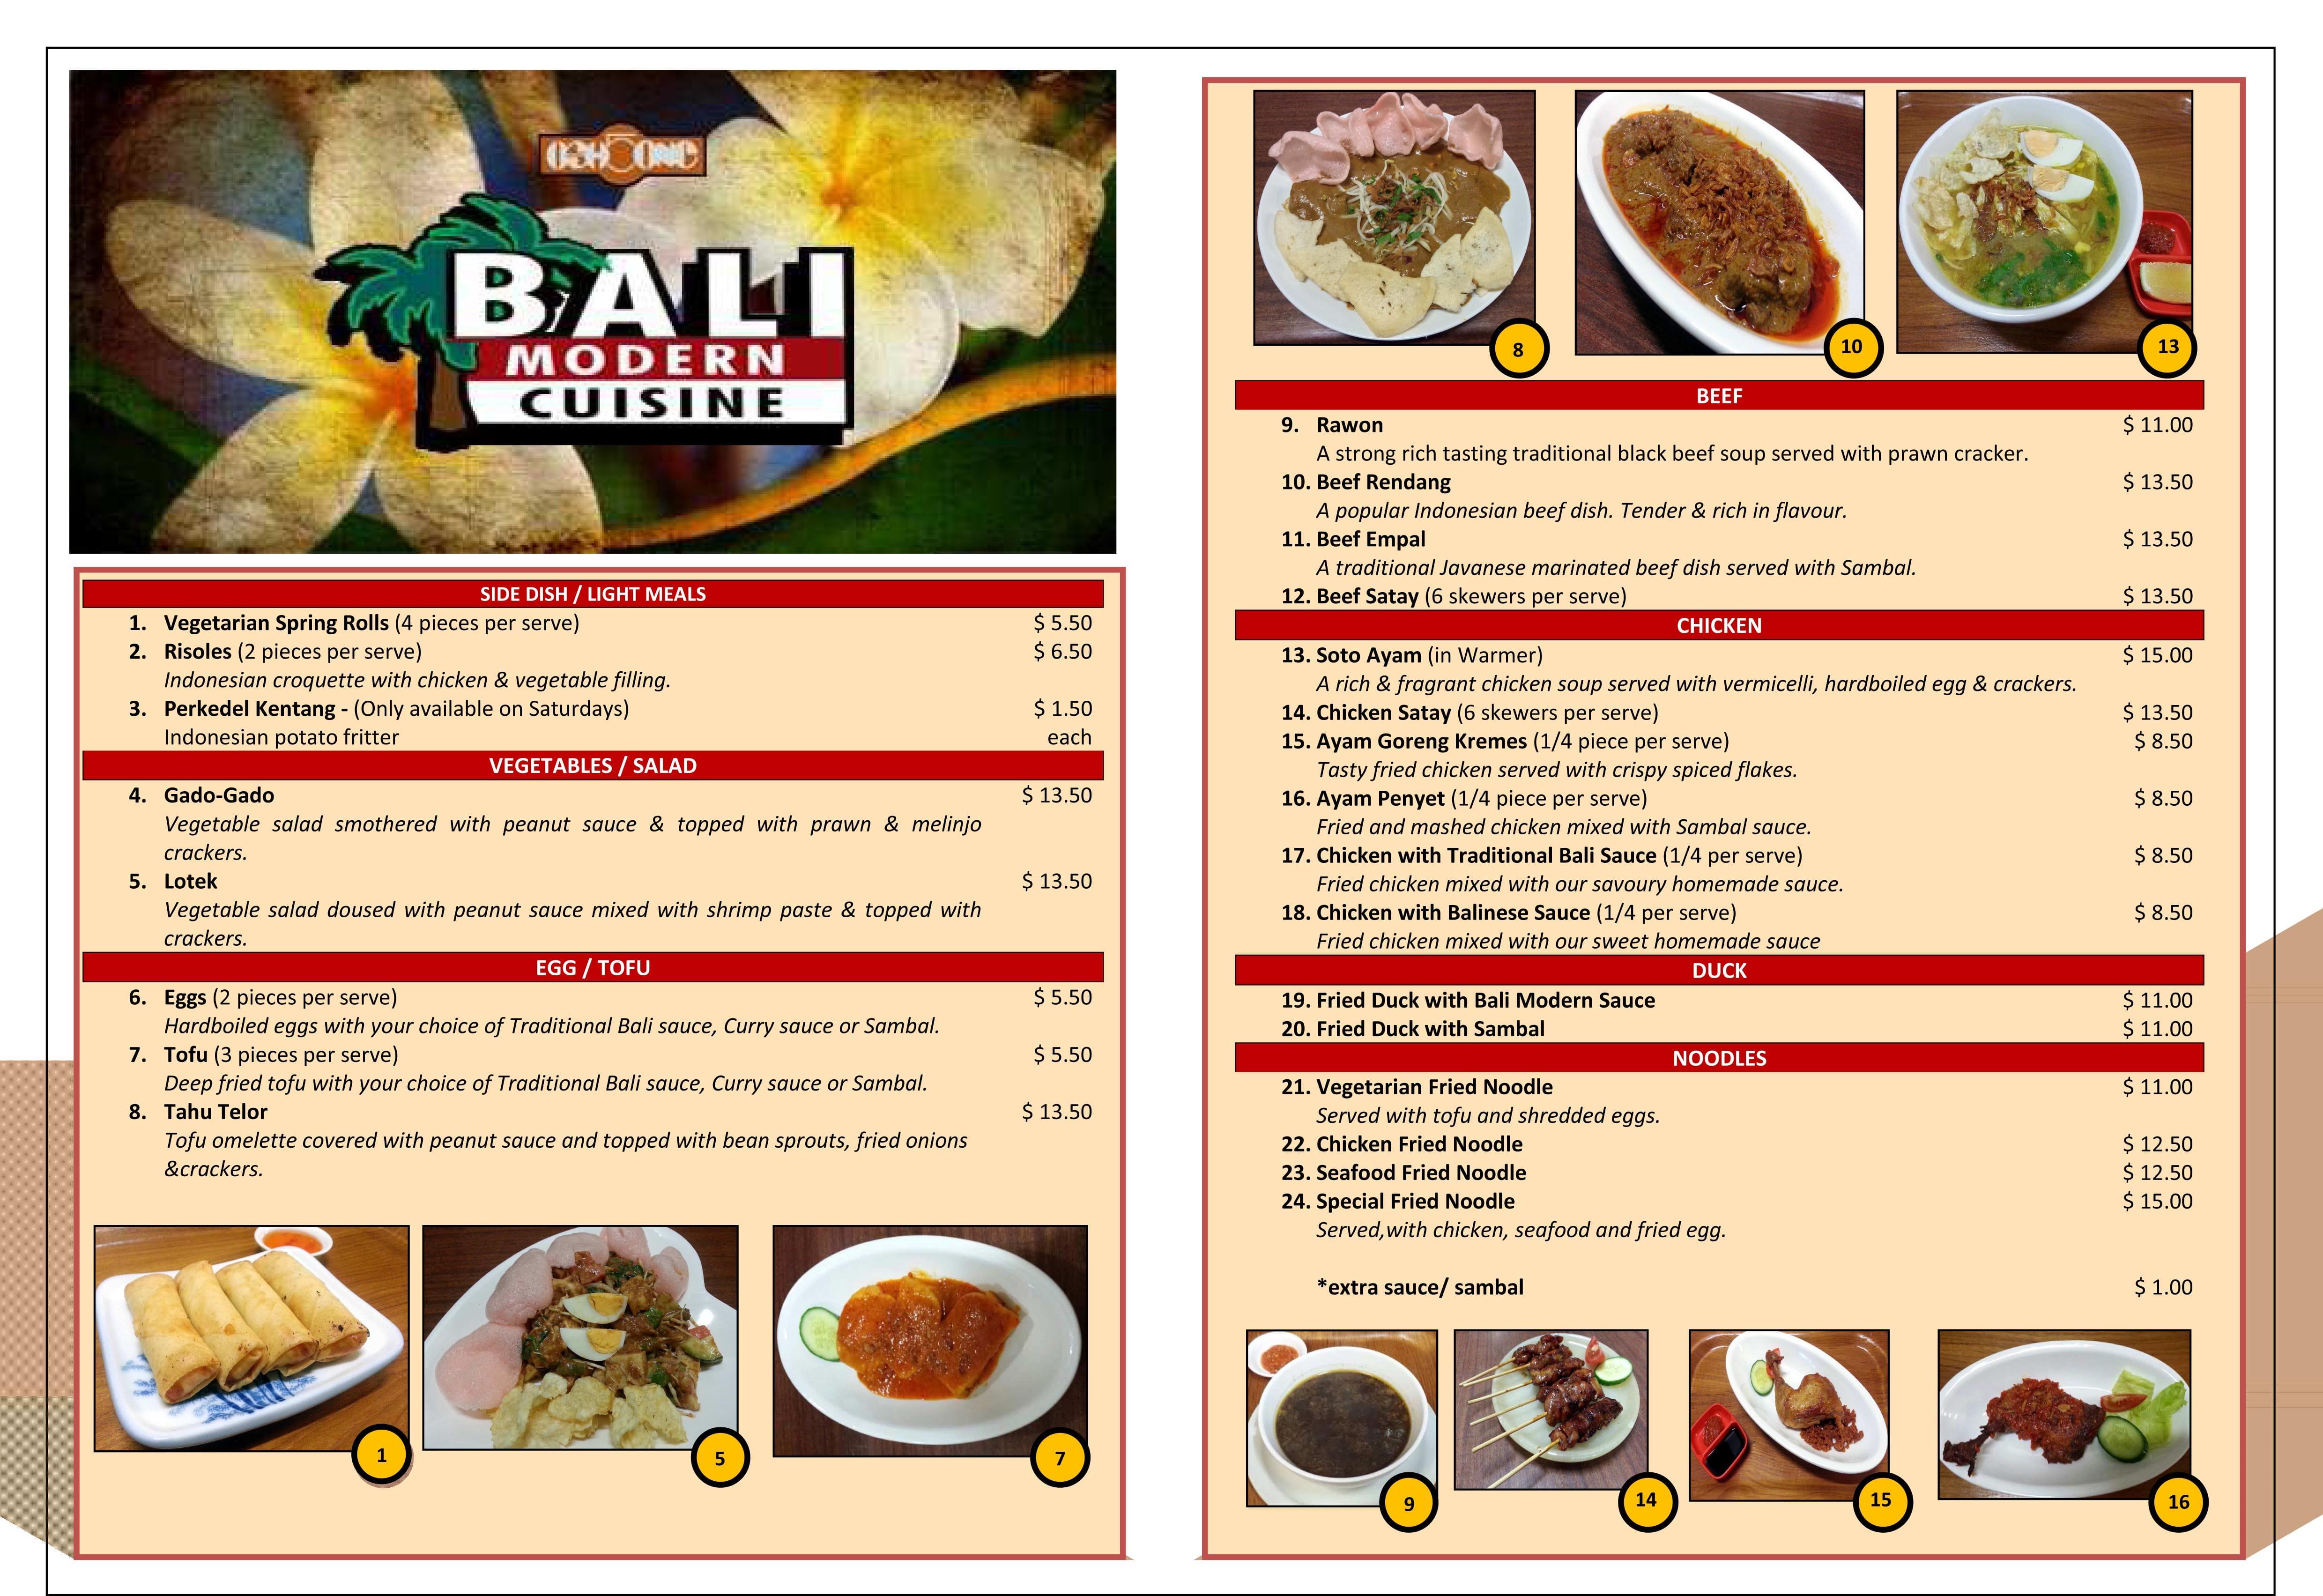 OSH5ONE - Bali Modern Cuisine Menu - Urbanspoon/Zomato